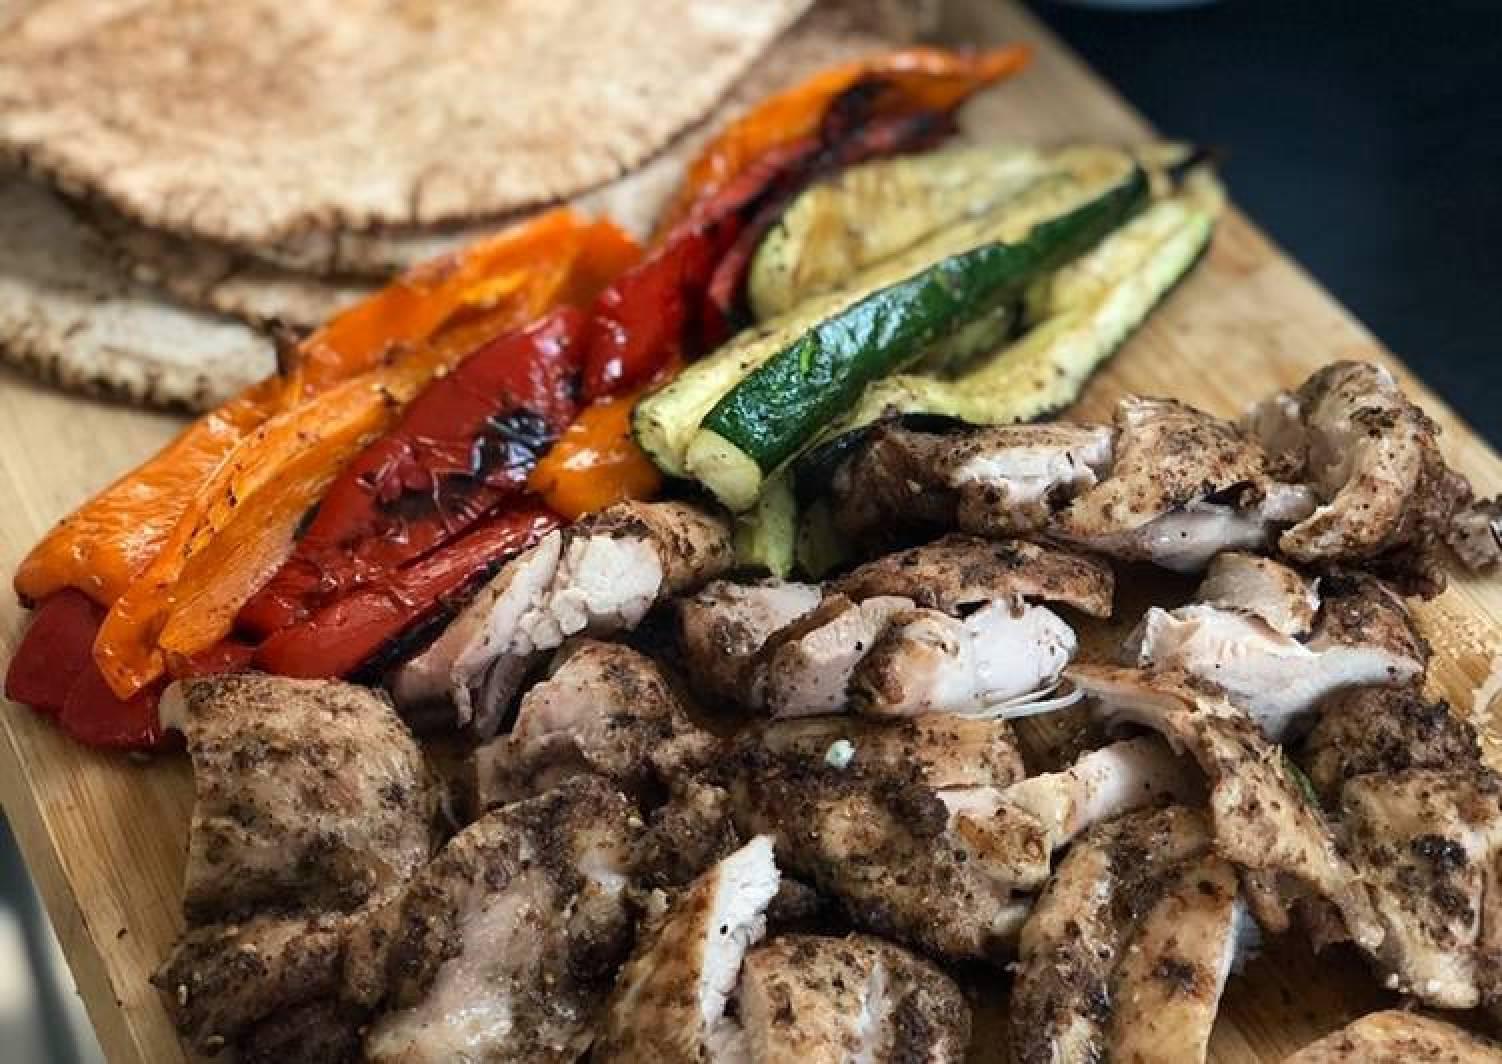 BBQ Za'atar chicken feast 🇱🇧